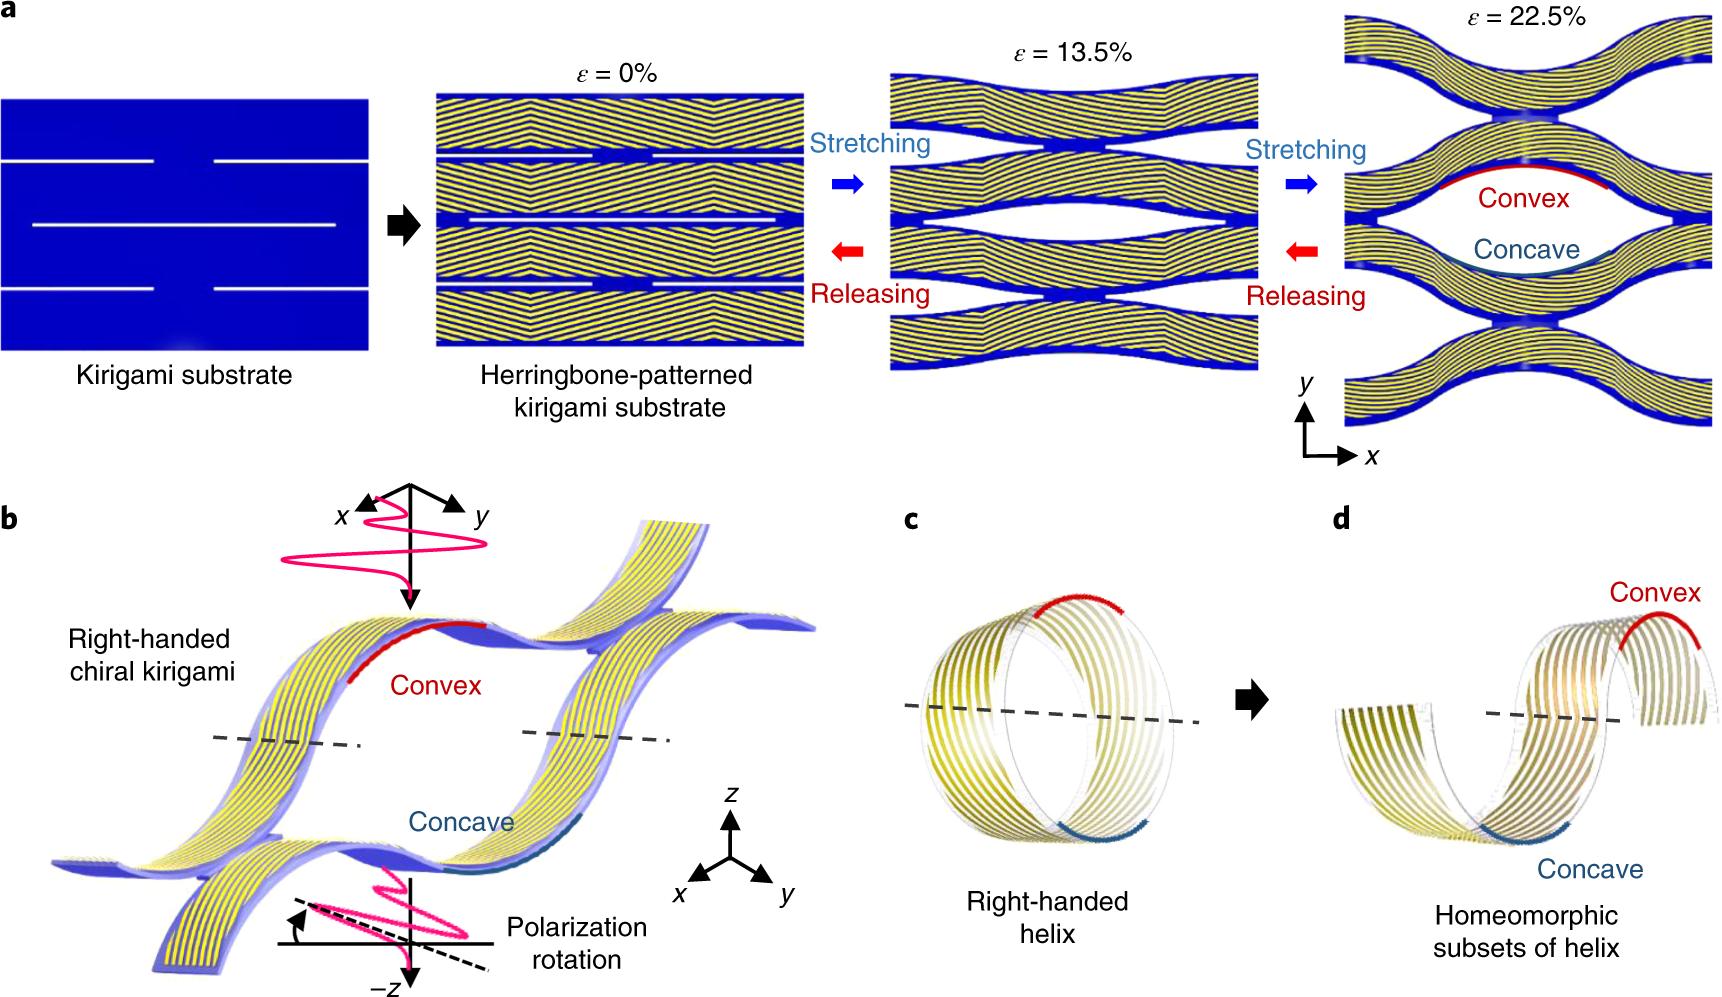 Terahertz circular dichroism spectroscopy of biomaterials